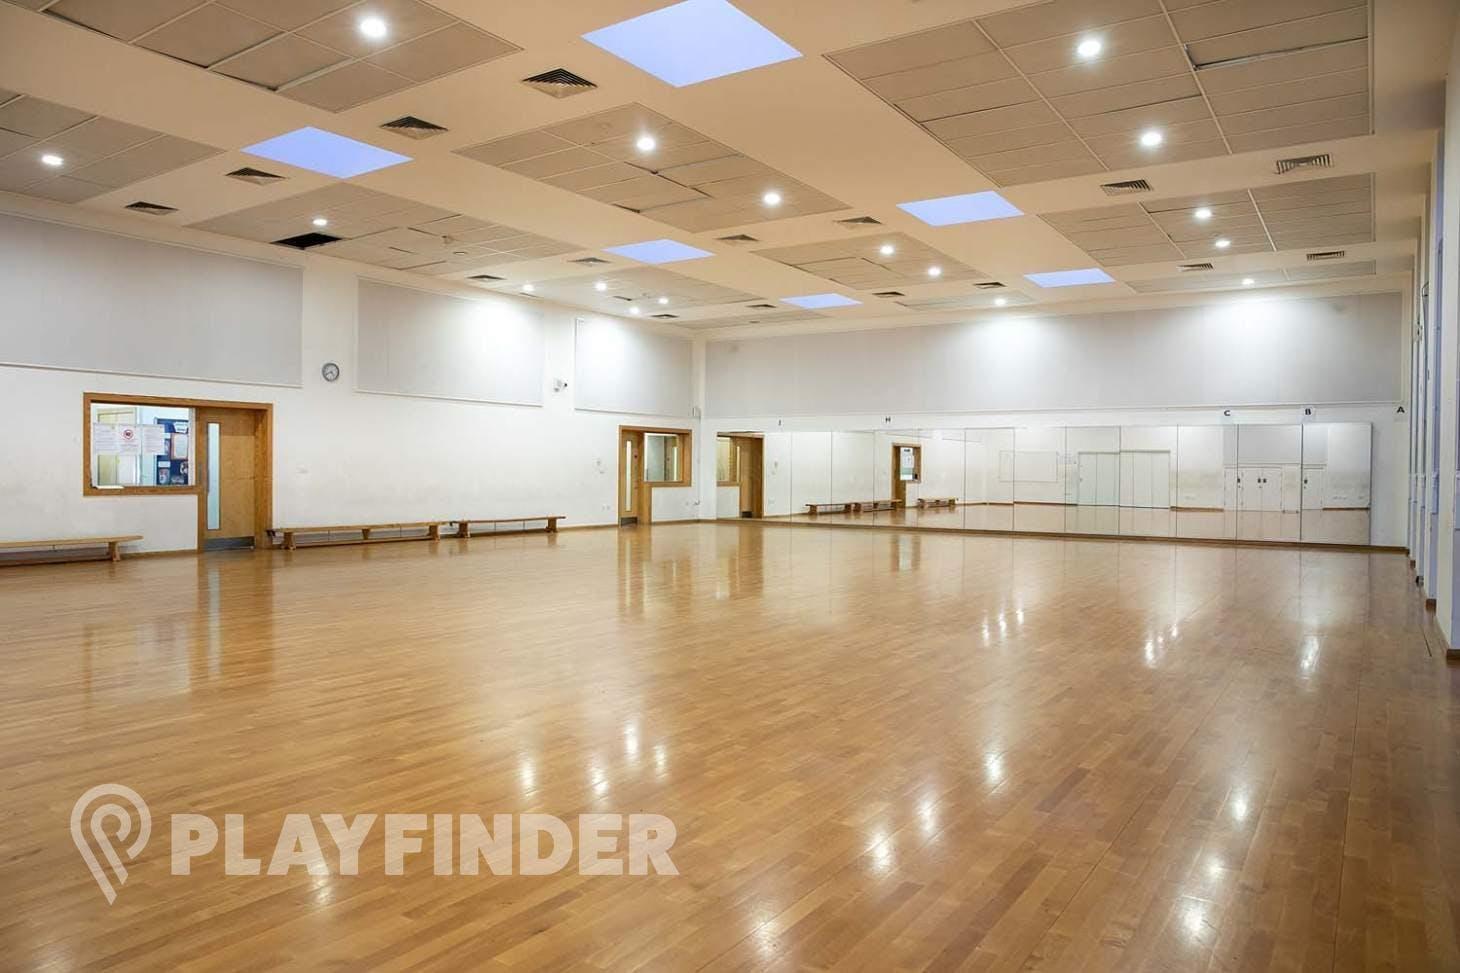 Somers Town Community Sports Centre Studio | Dance studio space hire